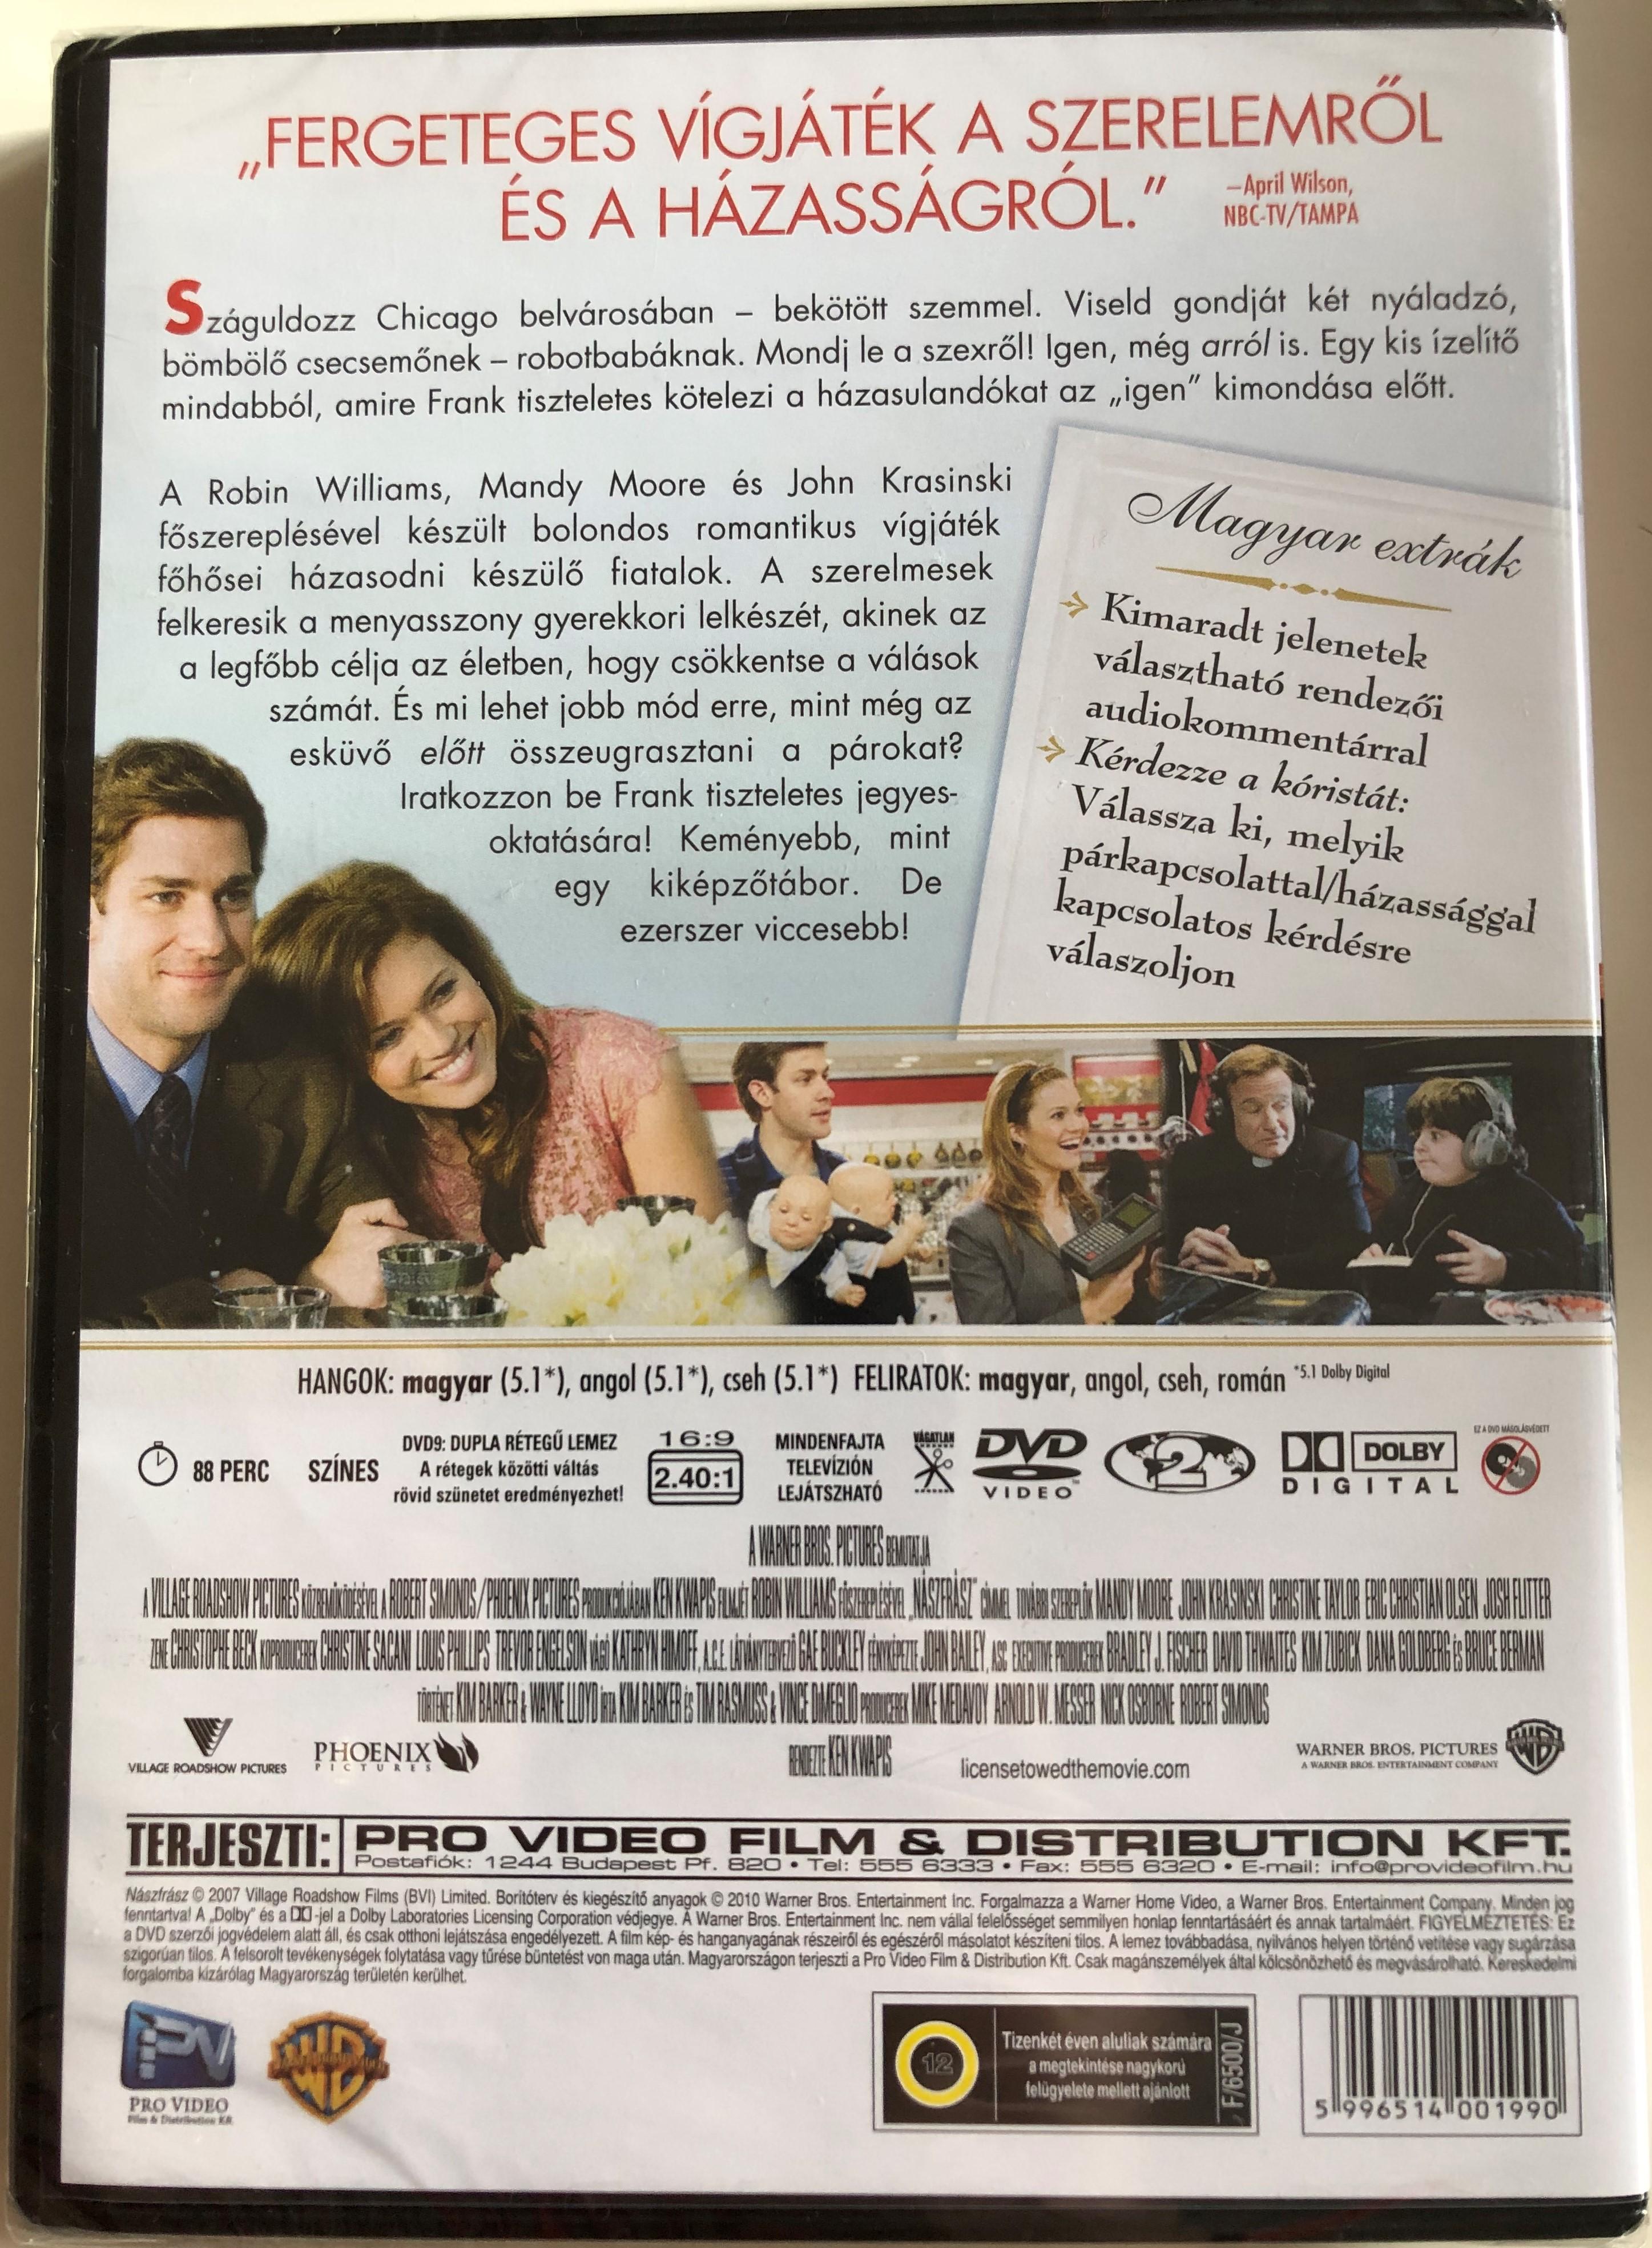 License To Wed Dvd 2007 Naszfrasz Directed By Ken Kwapis Starring Robin Williams Mandy Moore John Krasinski Christine Taylor Bibleinmylanguage